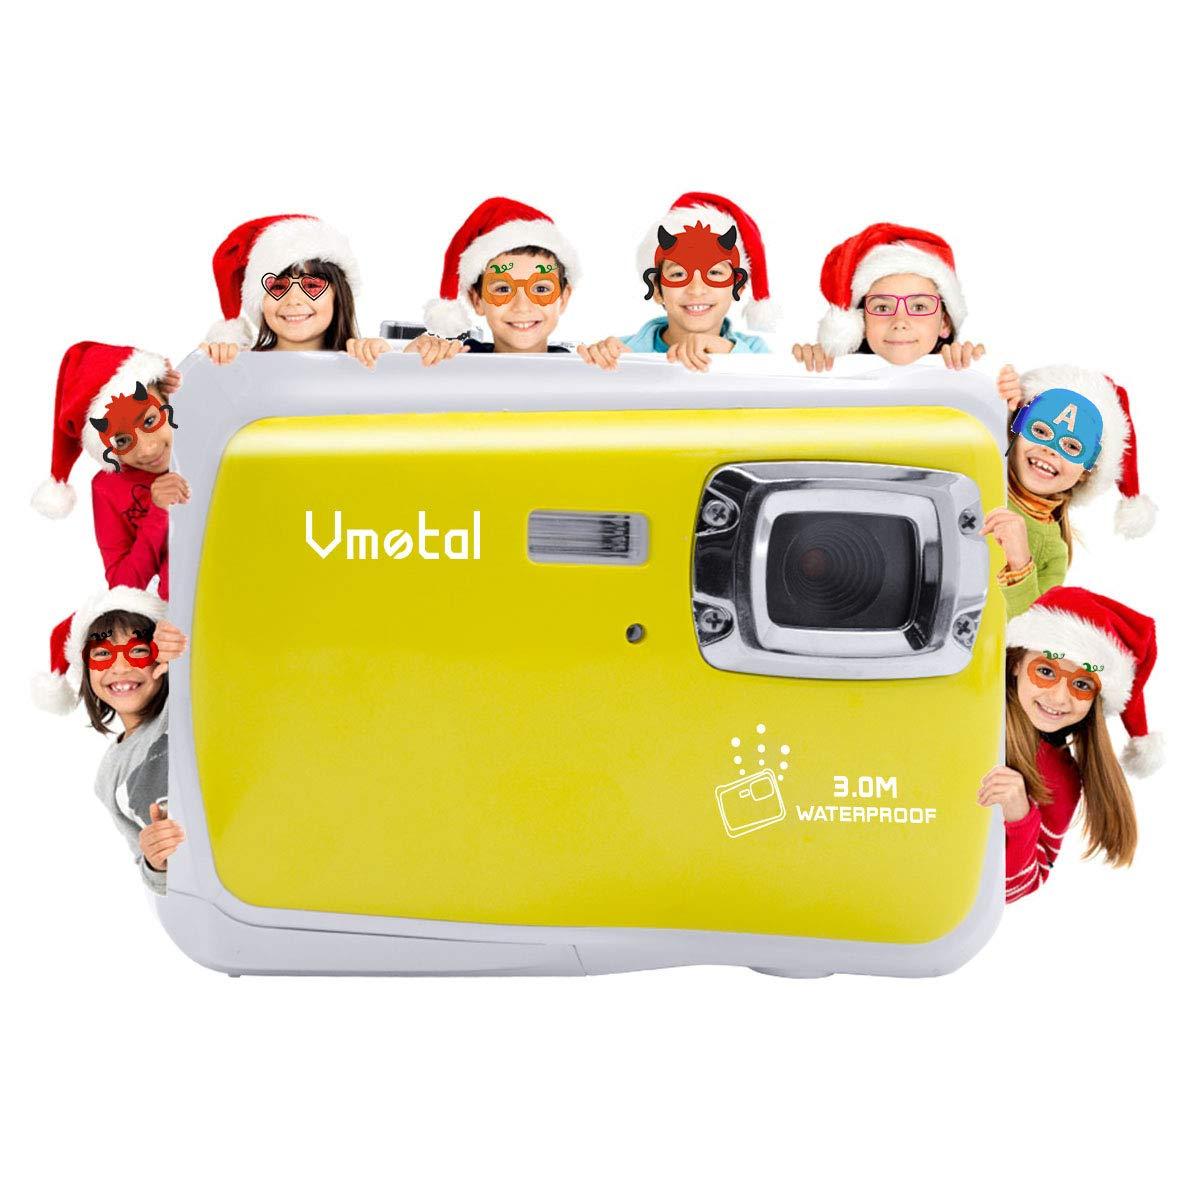 Kids Waterproof Camera, Vmotal Digital Camera for Kids 2.0 Inch TFT Display Children Kids Digital Camera (Yellow) by Vmotal